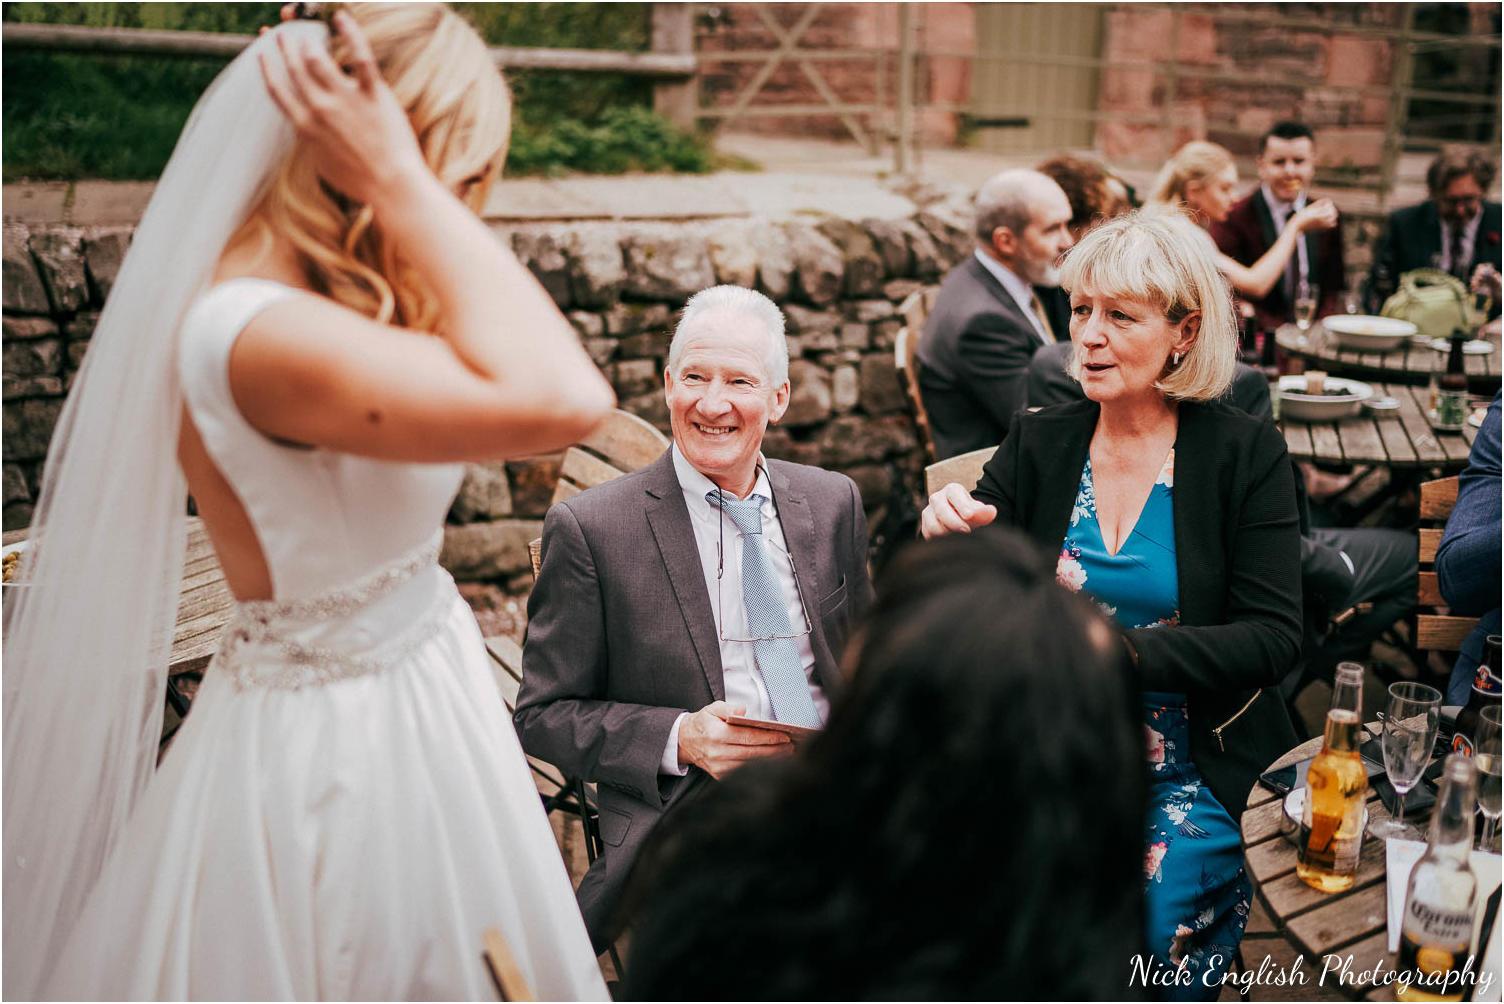 The_Ashes_Barn_Endon_Stoke_Wedding_Photographer-68.jpg